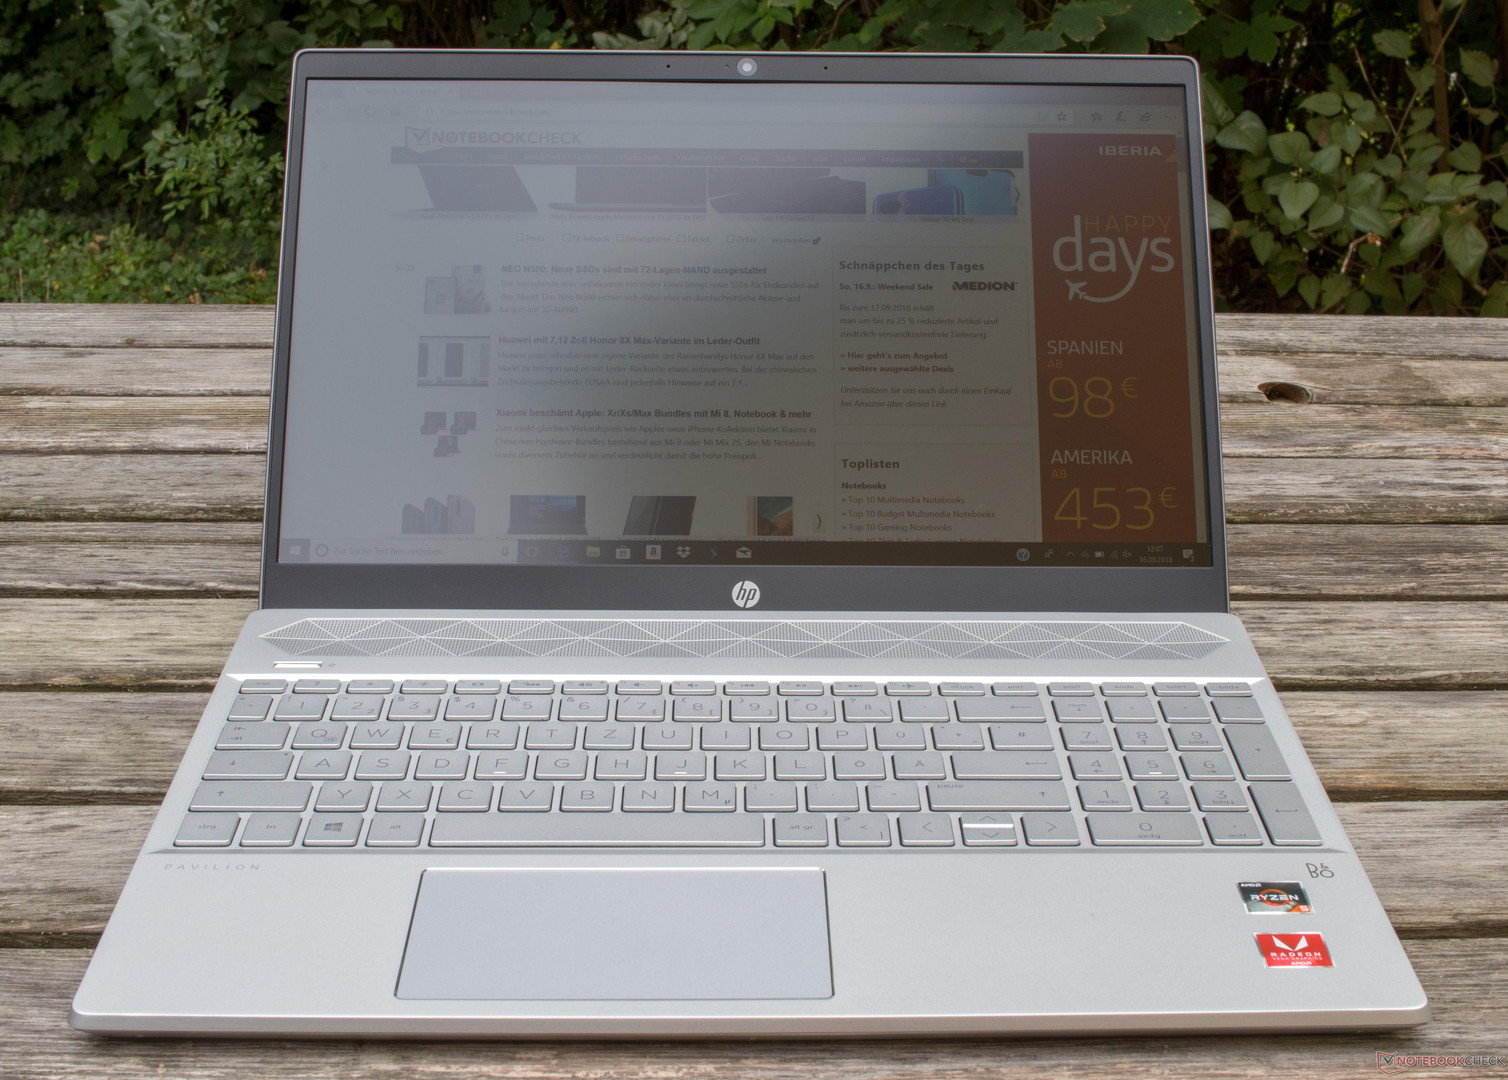 Hp Pavilion 15 Amd Ryzen 5 2500u Vega 8 Laptop Review Notebookcheck Net Reviews